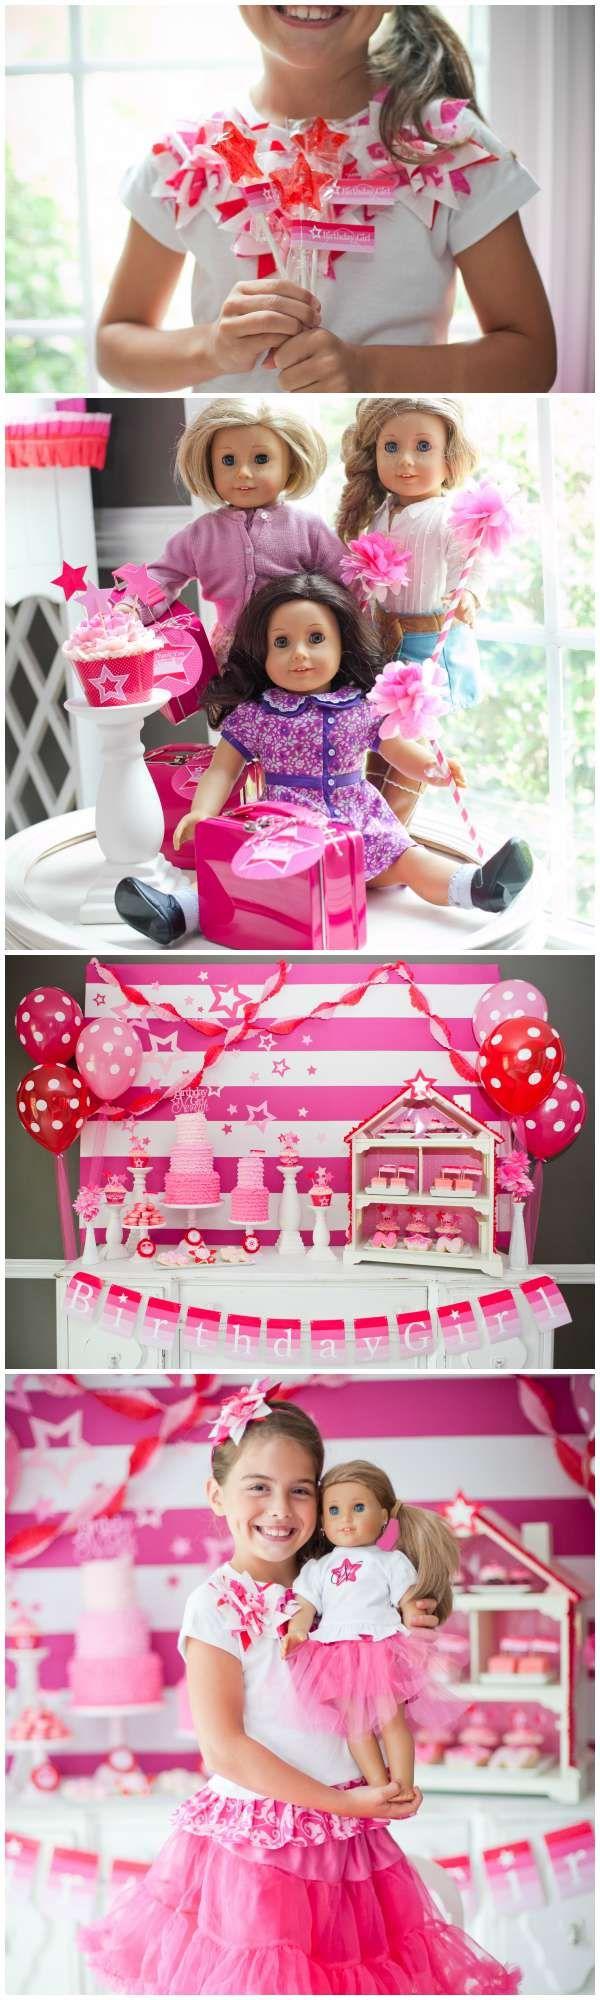 American Girl Birthday Party Ideas